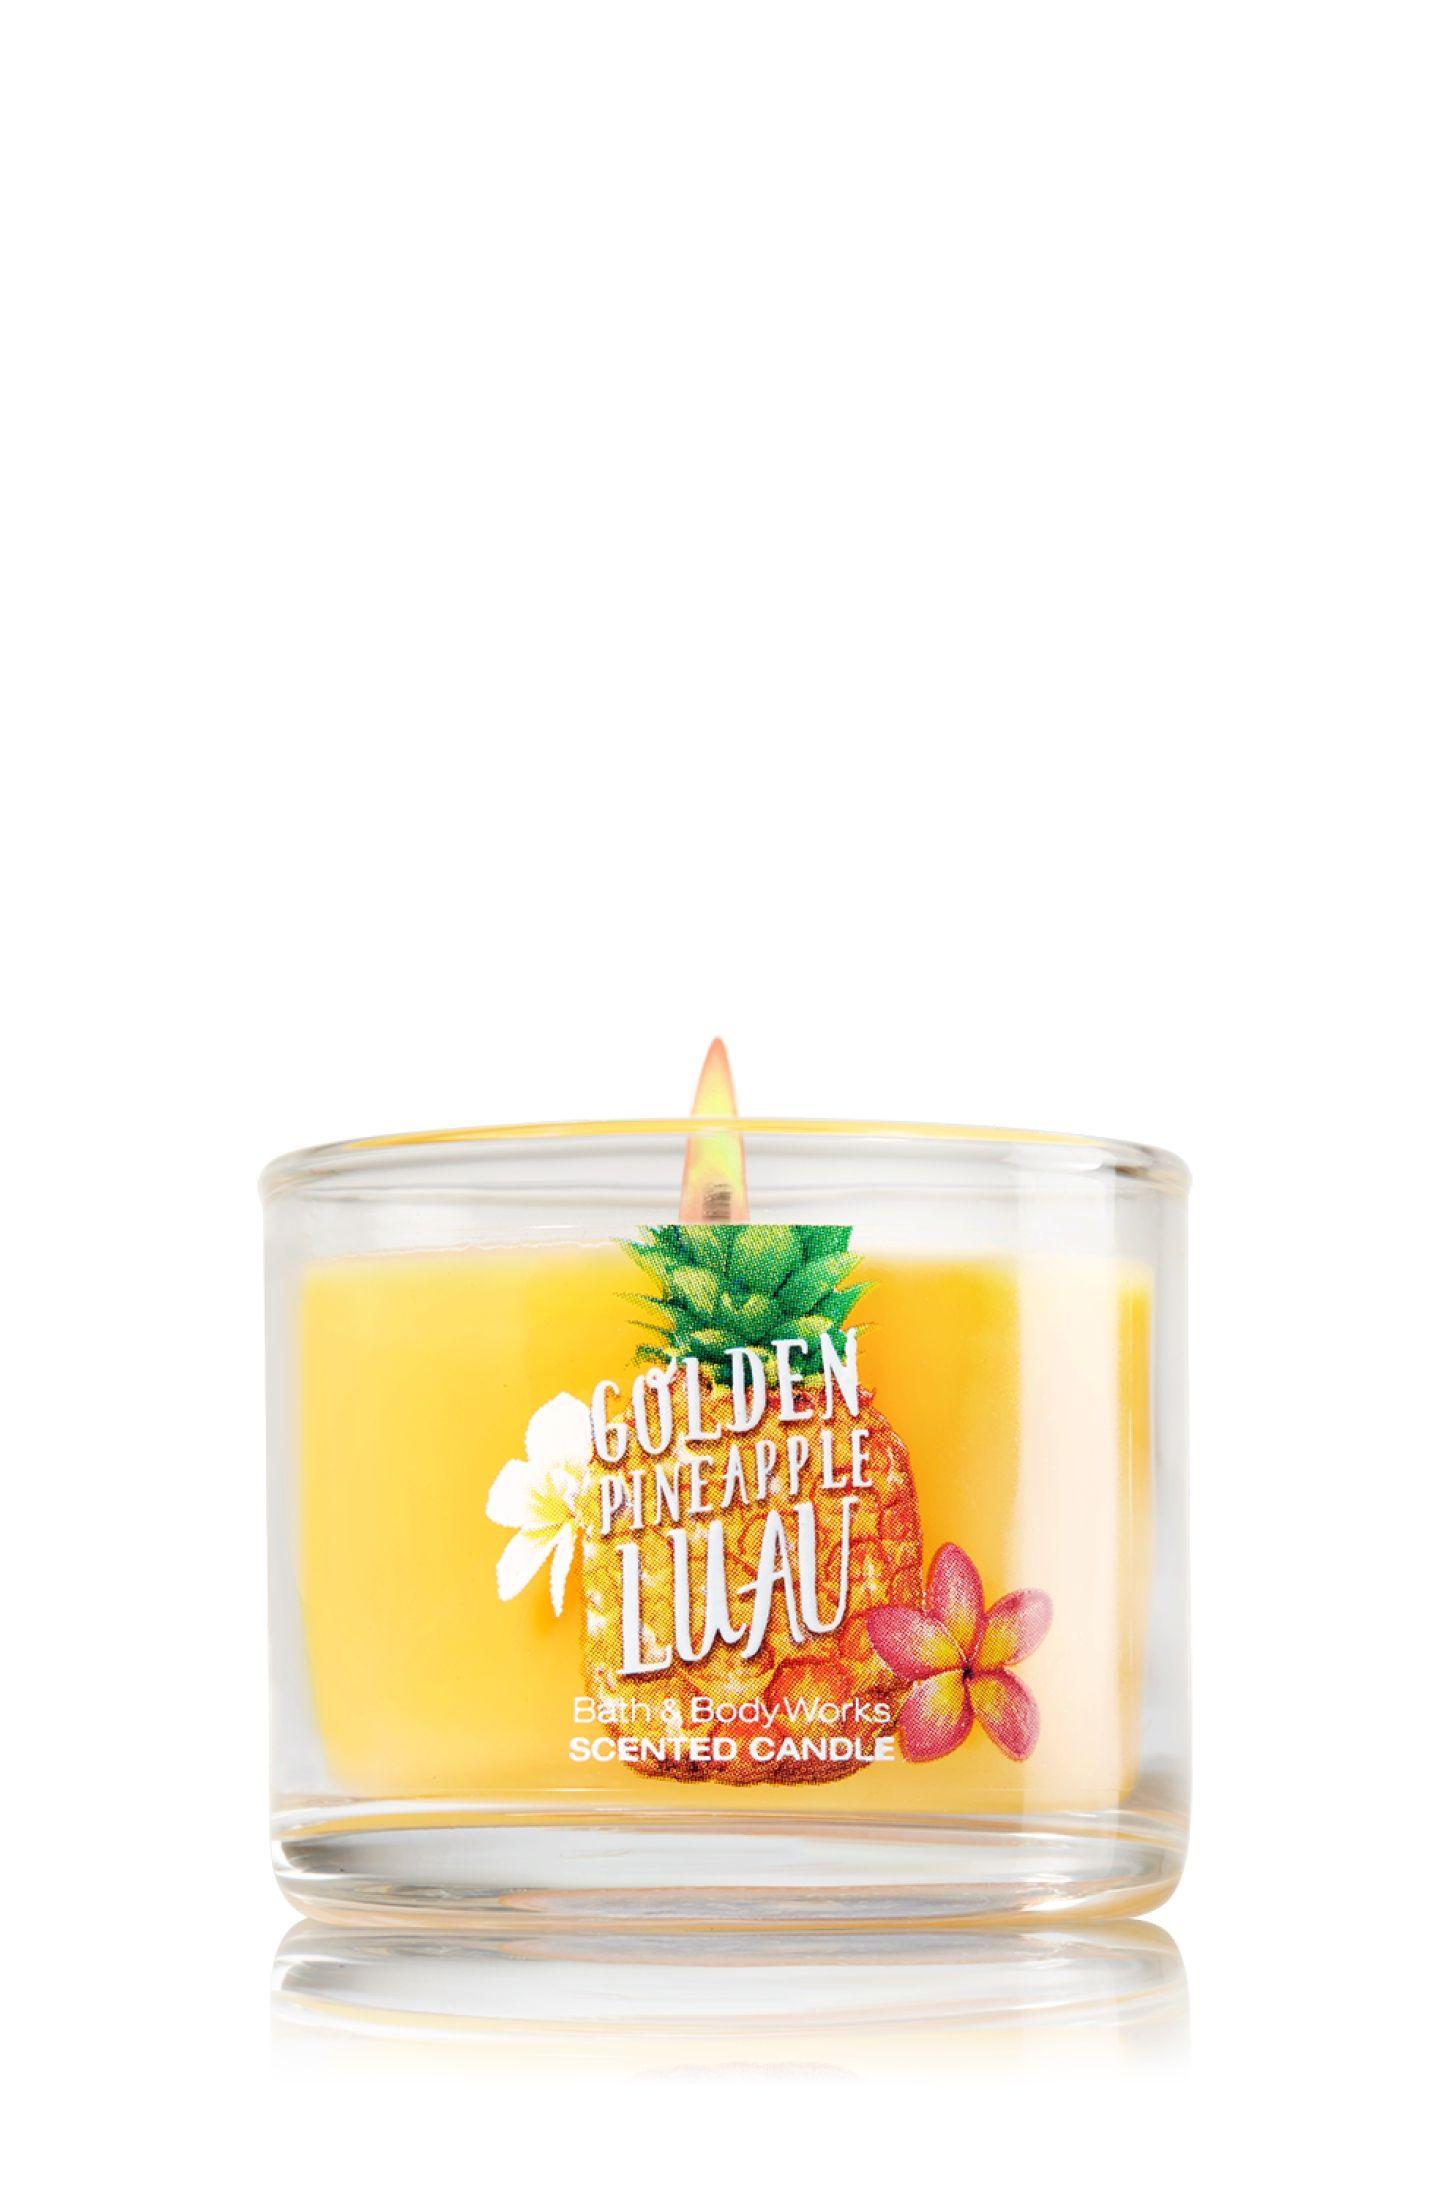 Golden Pineapple Luau Mini Candle Home Fragrance 1037181 Bath